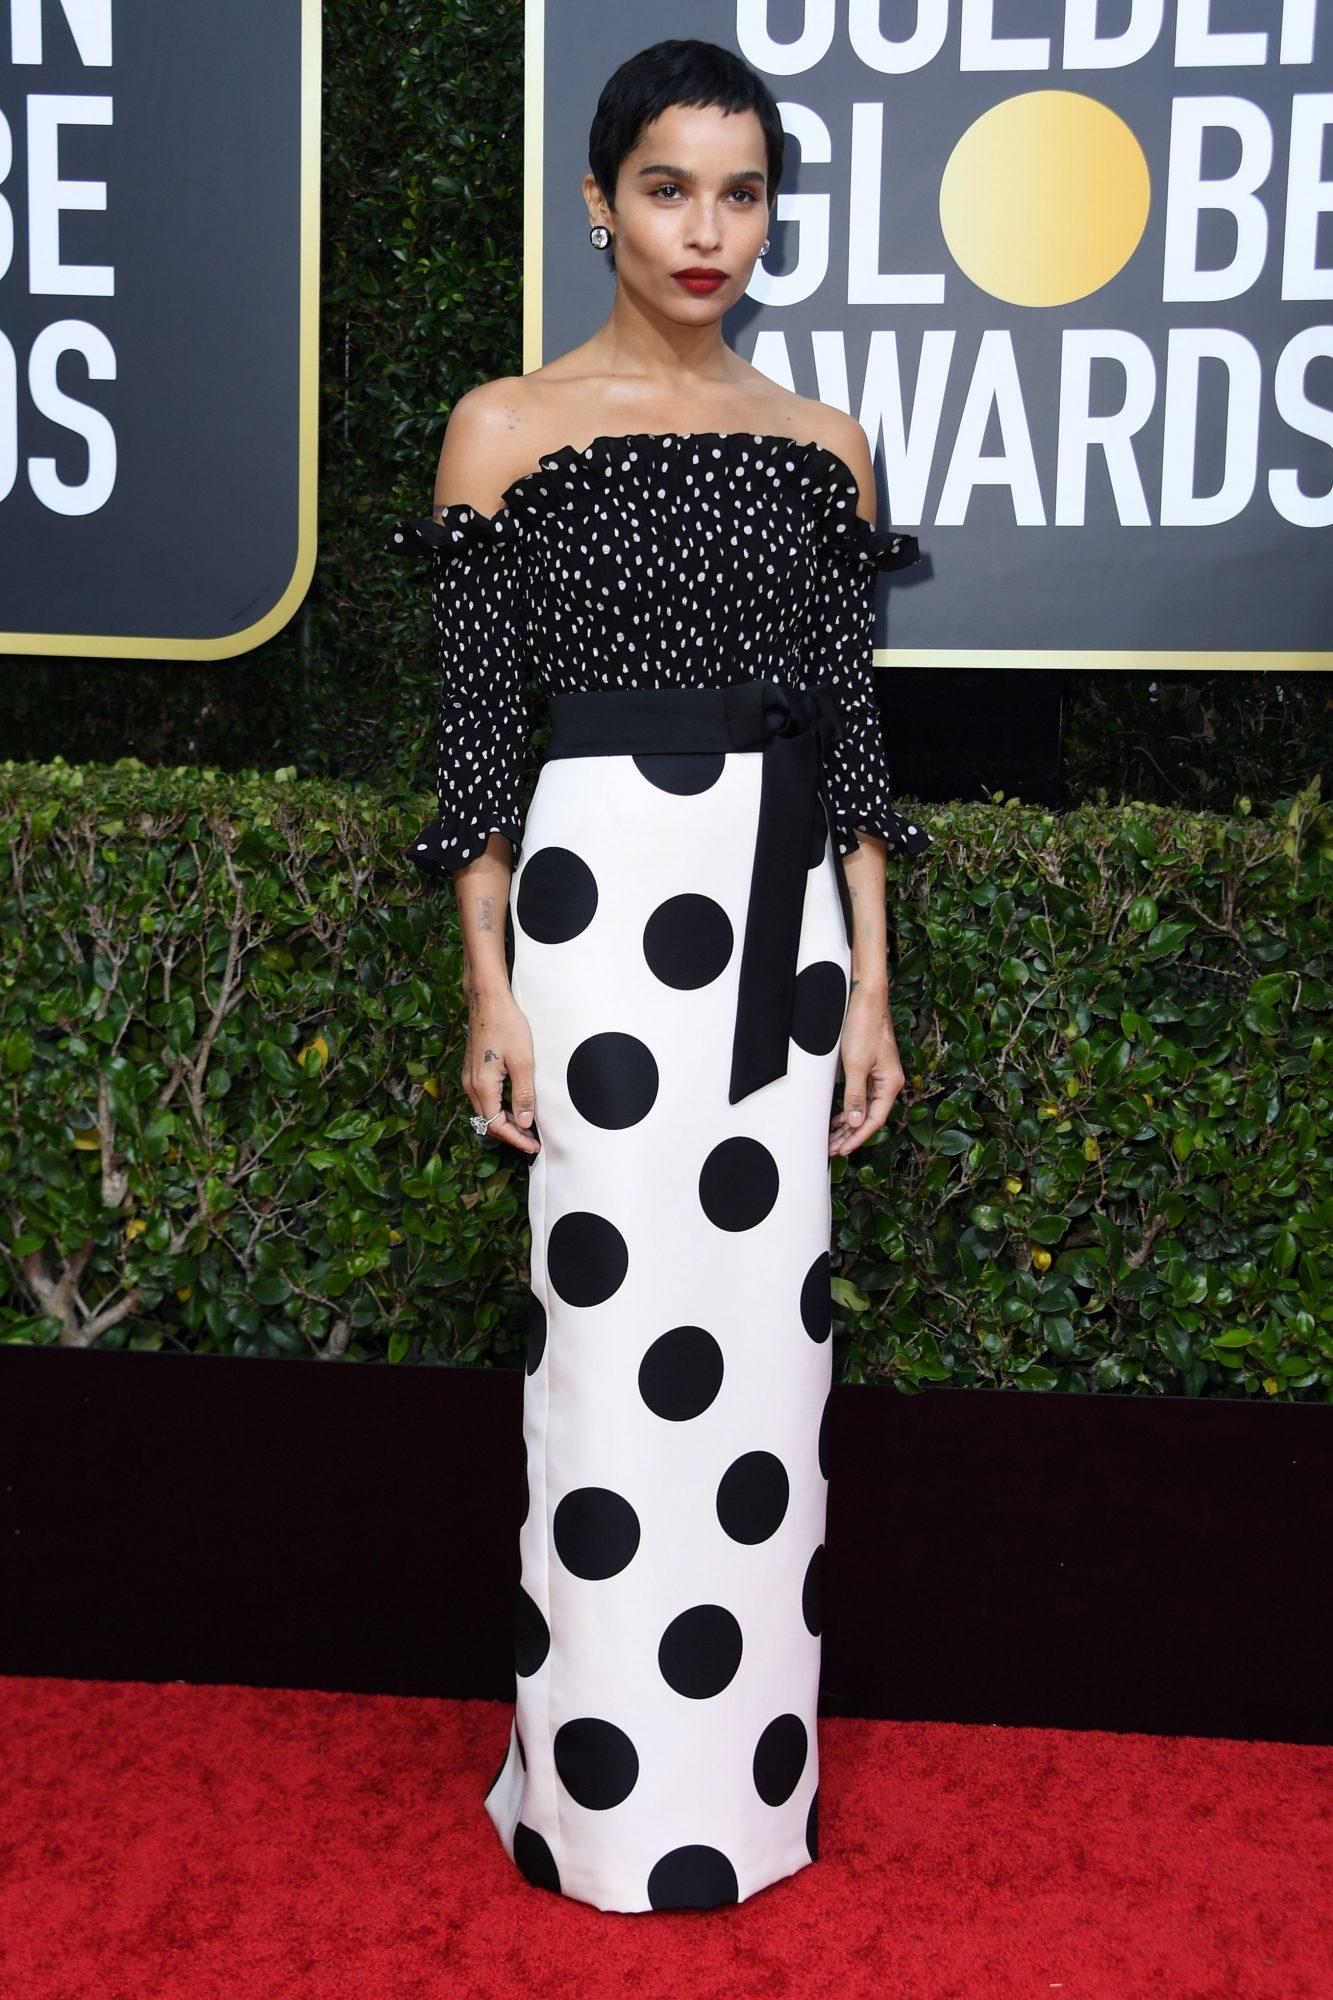 Zoe Kravitz Alfombra Roja Golden Globes 2020